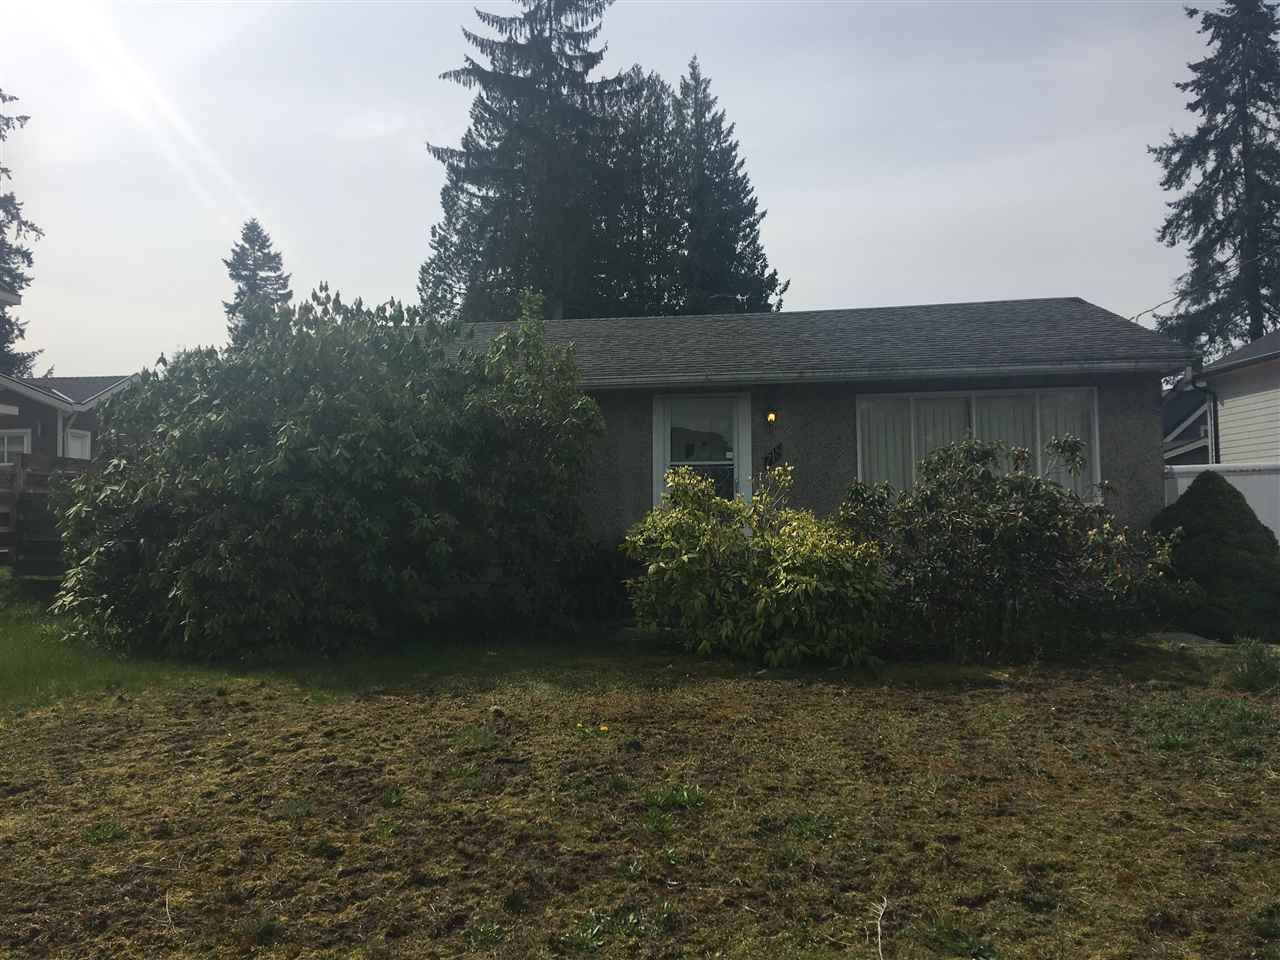 Main Photo: 718 REGAN Avenue in Coquitlam: Coquitlam West House for sale : MLS®# R2362228